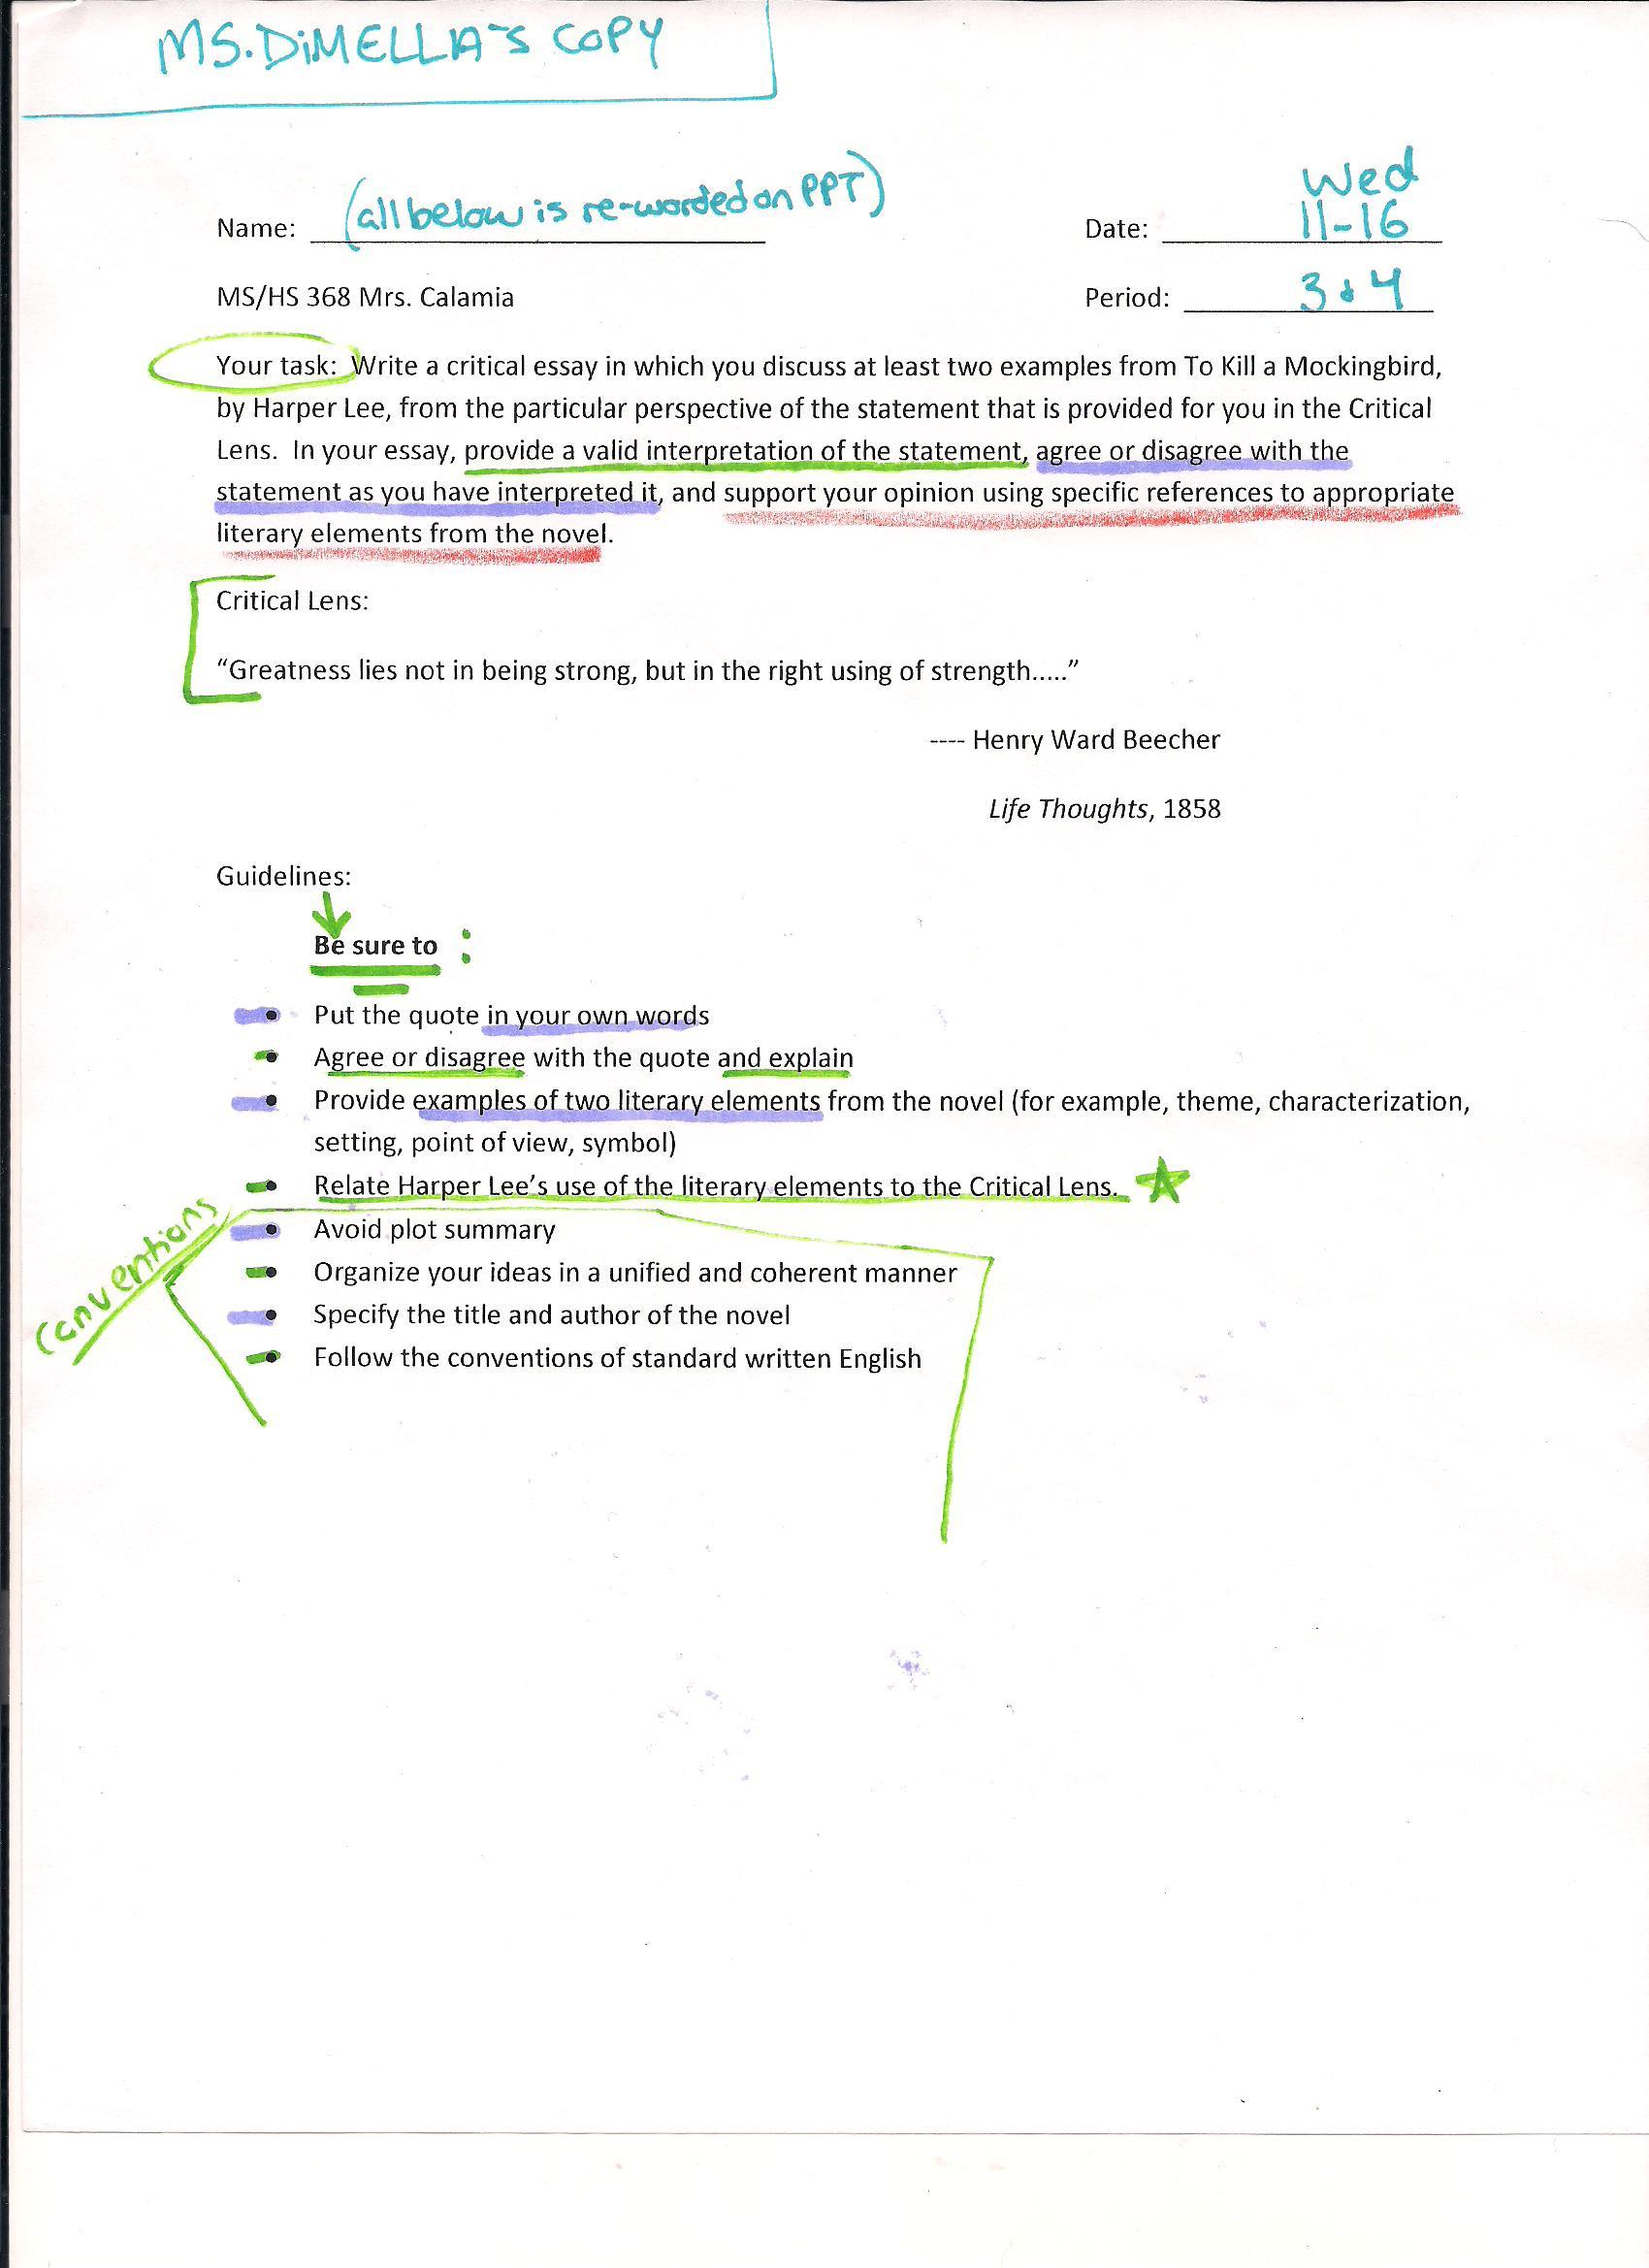 Case study 21.2 balanced books bookkeeping